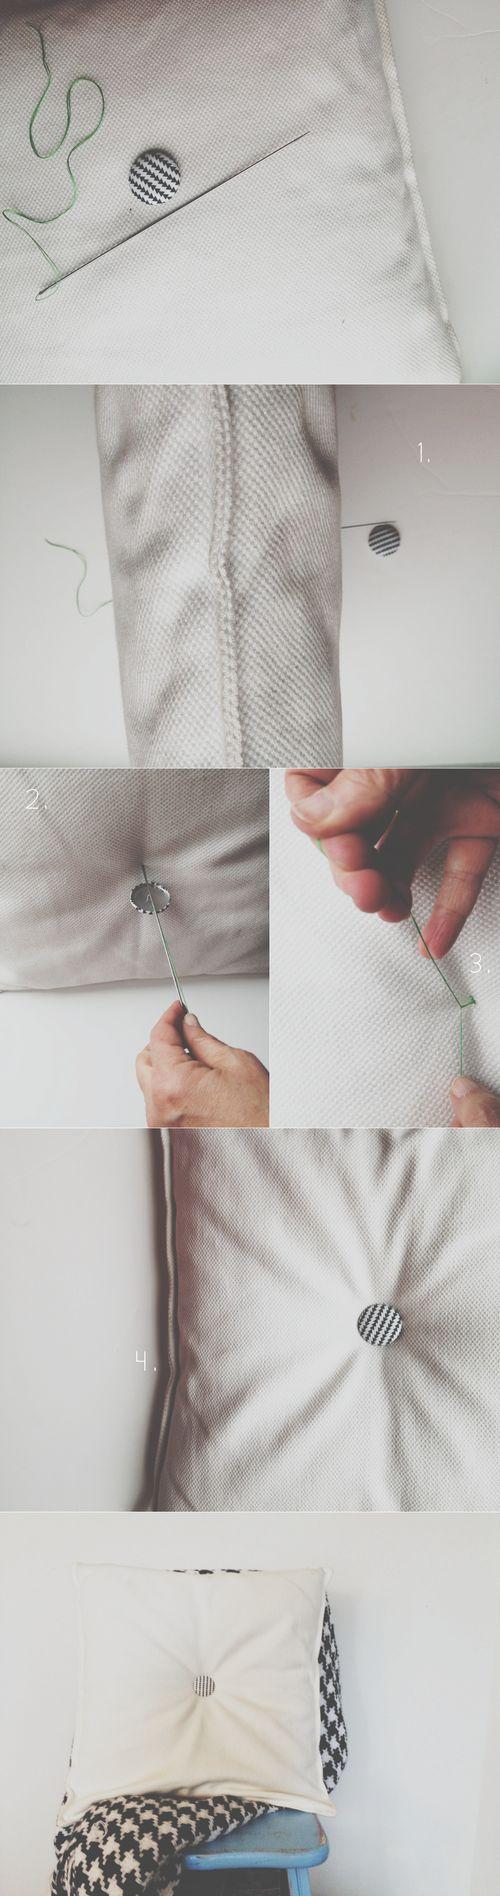 DIY Tufted Pillow / Cusion